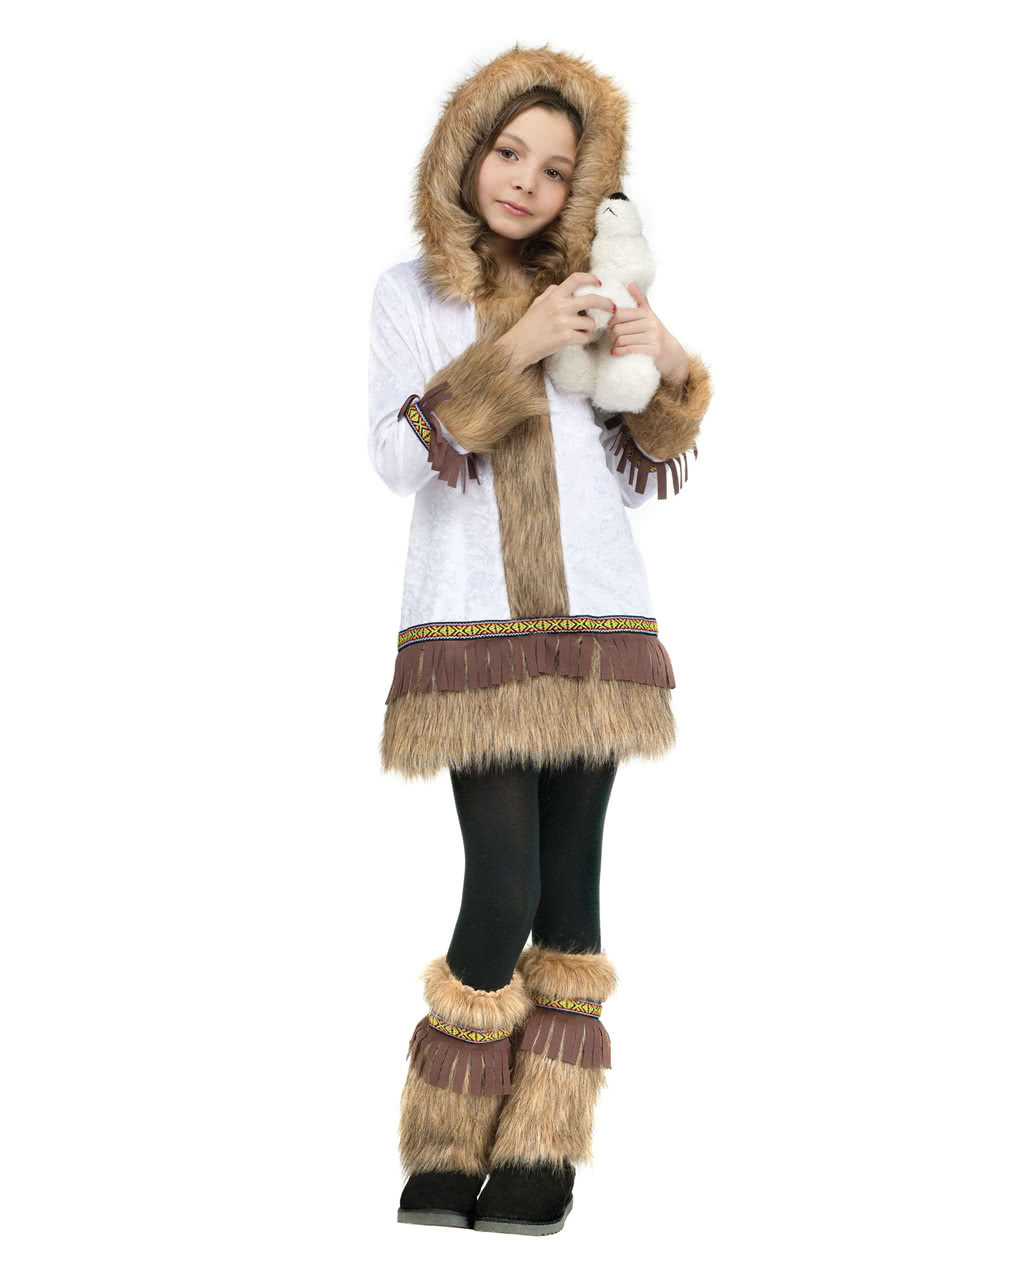 Susses Eskimo Madchen Kostum Fur Fasching Karneval Universe